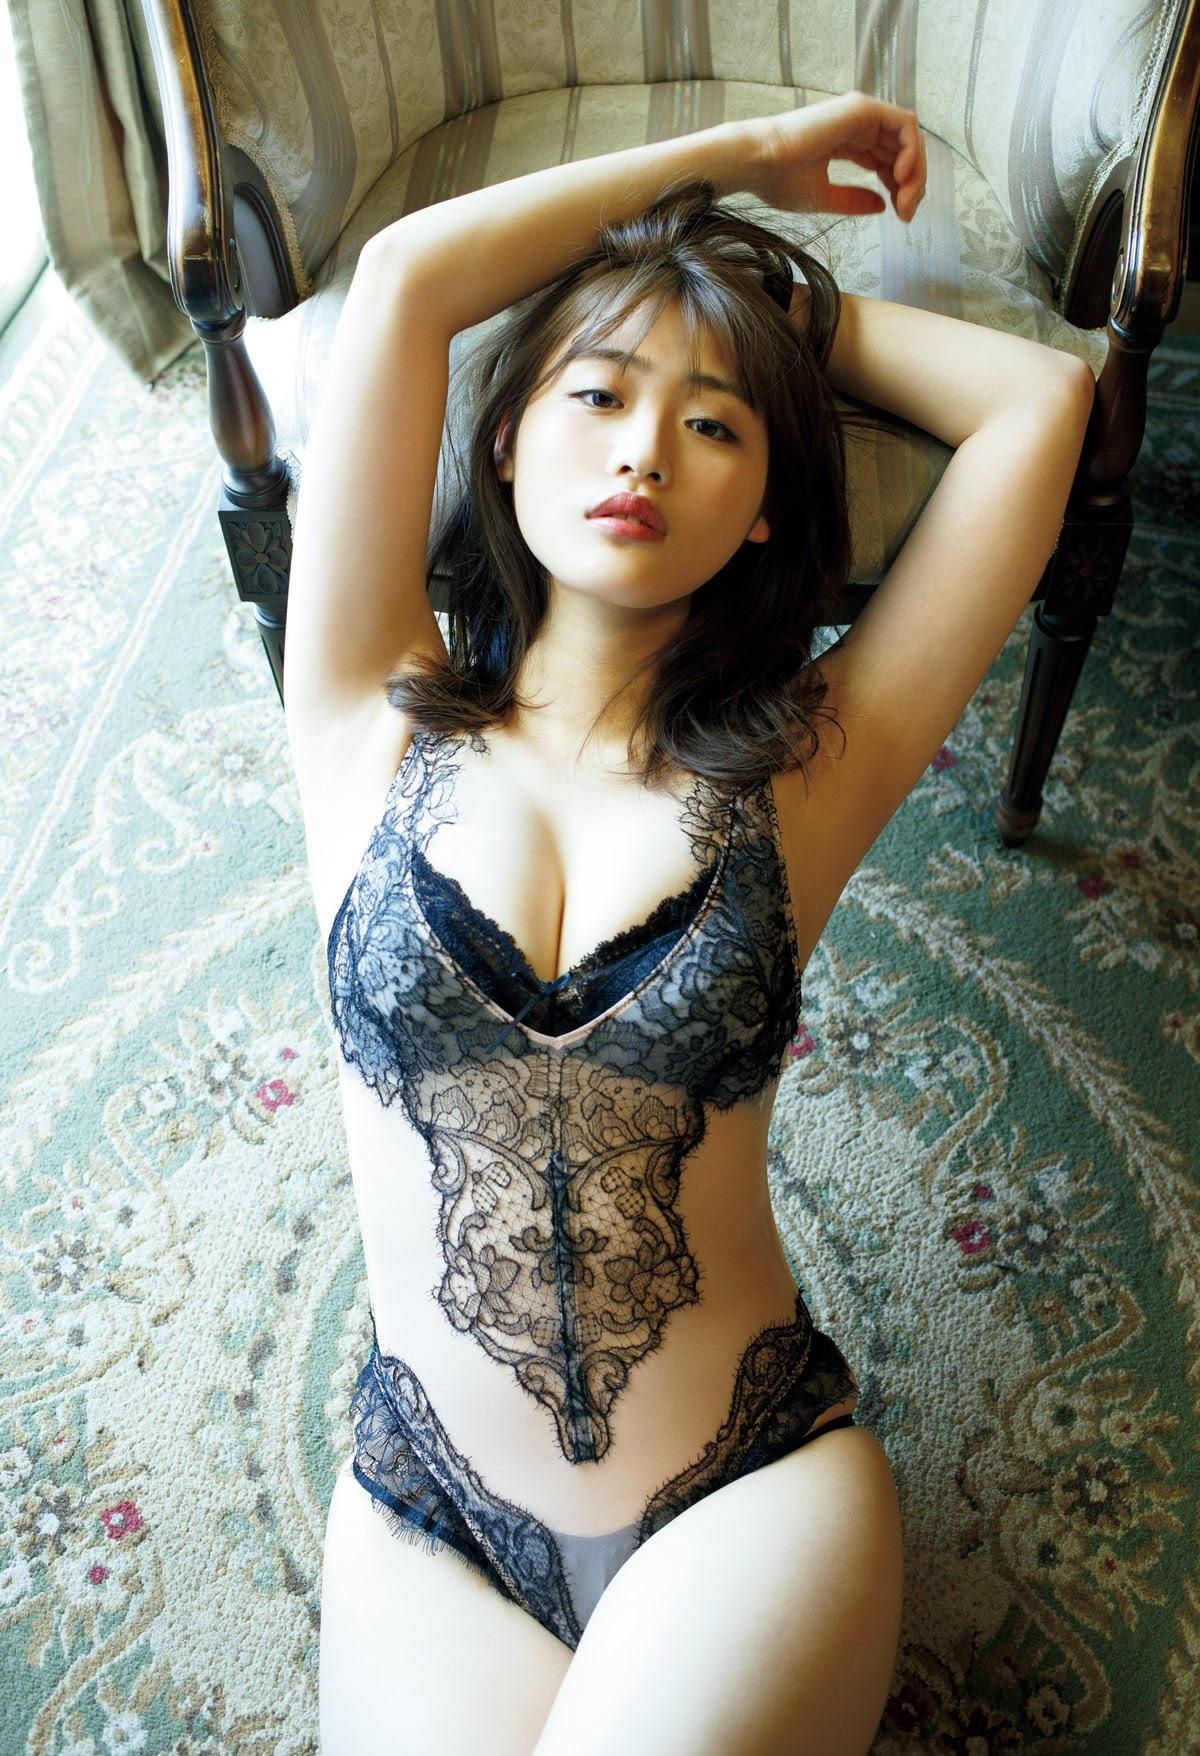 小山璃奈 頓知気さきな 伊藤美来-Weekly Playboy 2021年第十八期 高清套图 第37张